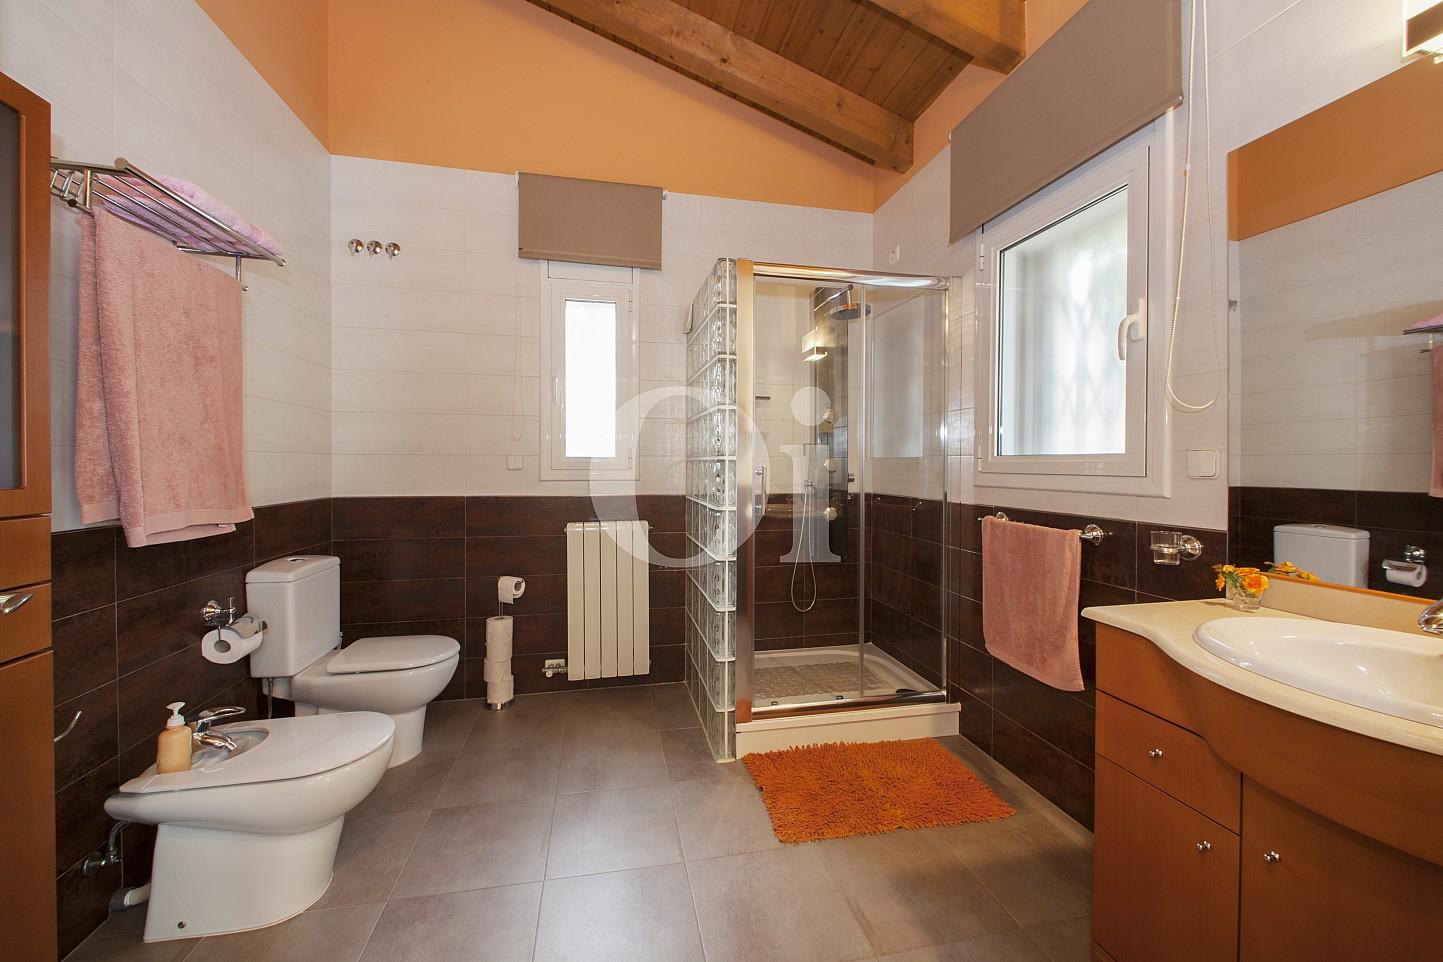 Baño de casa en venta en Segur de Calafell, Baix Penedès, Tarragona